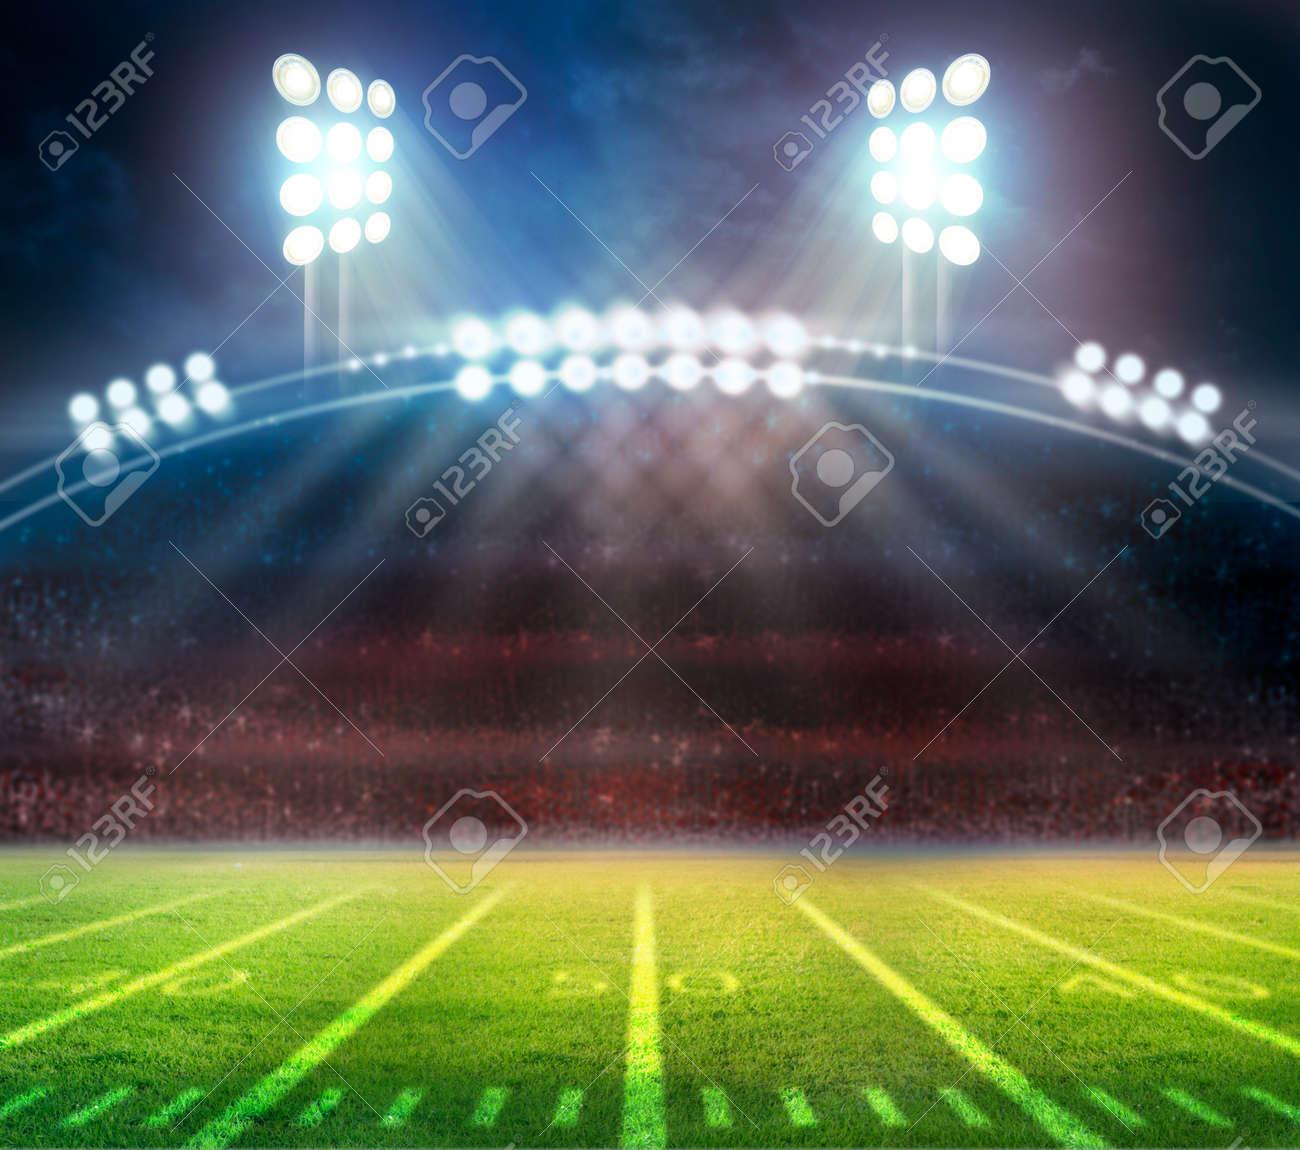 American Soccer Stadium 3d rendering - 129192519